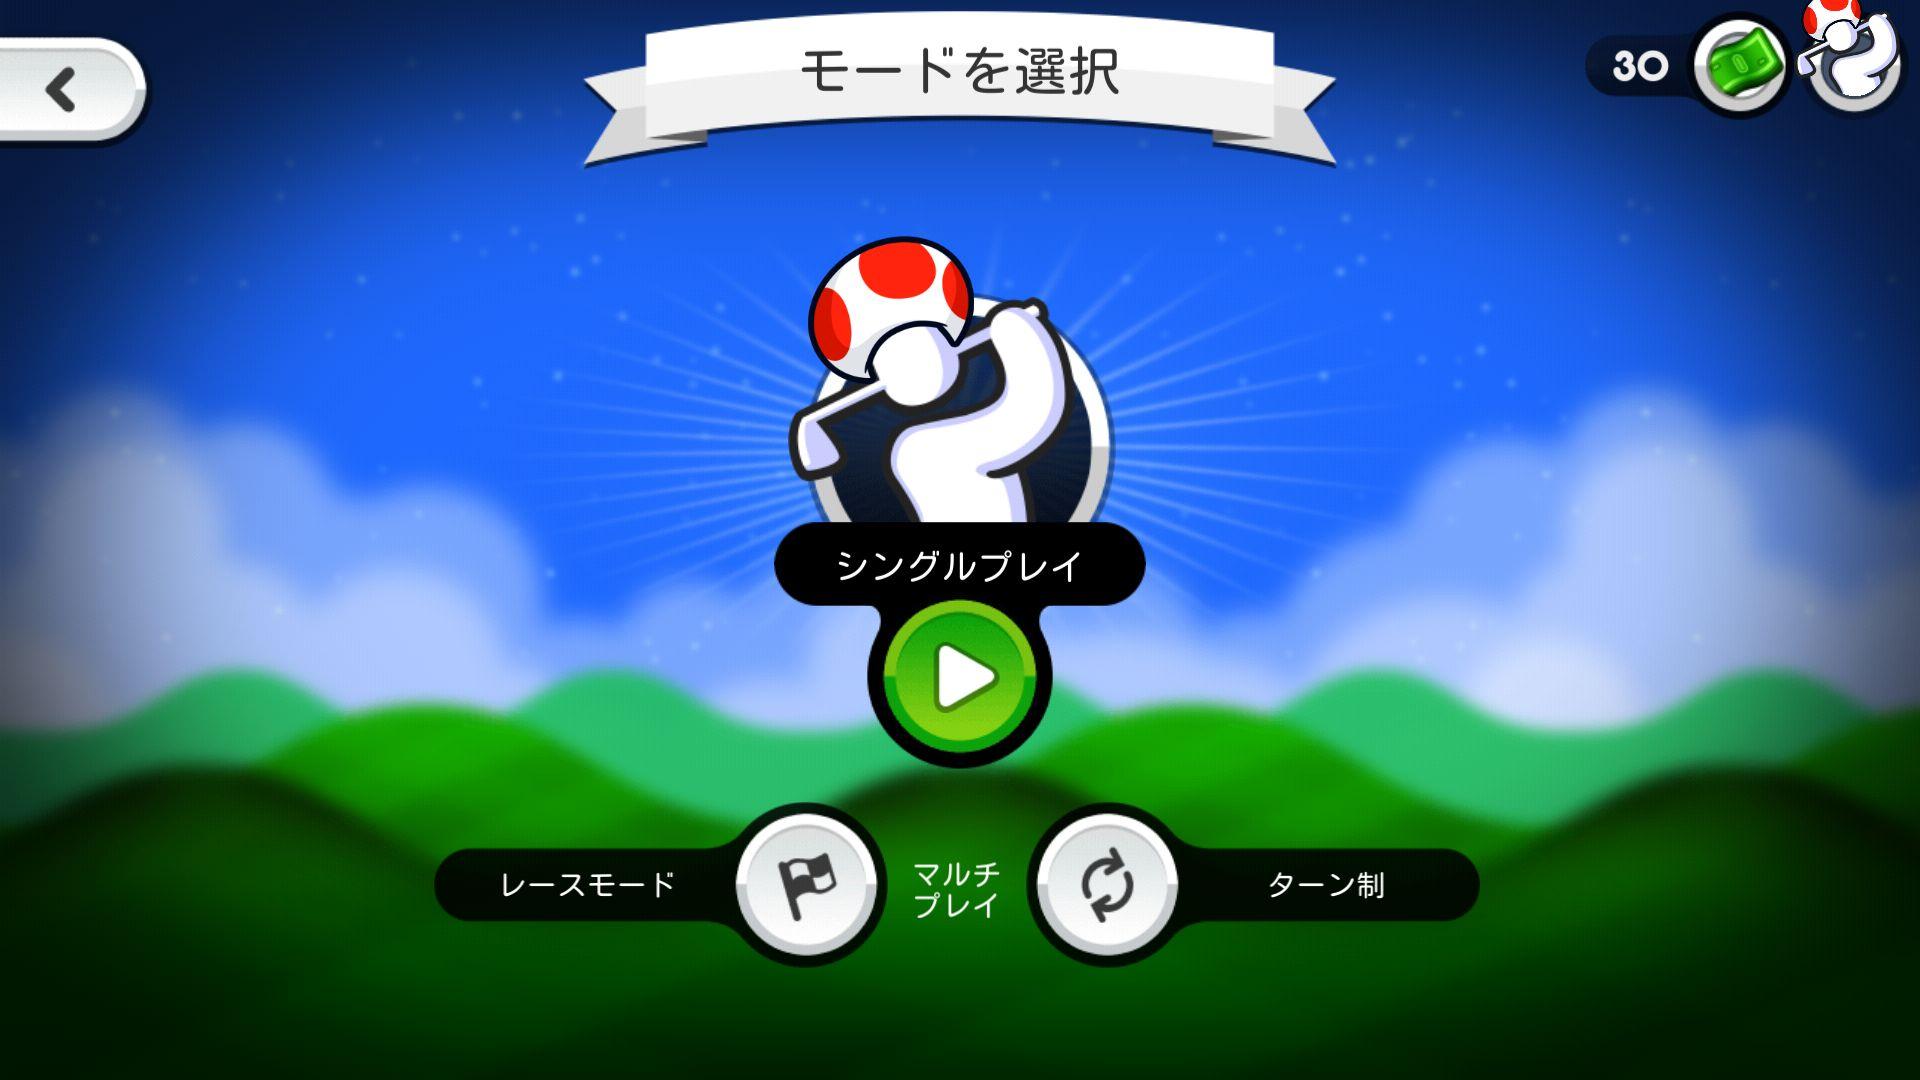 androidアプリ Super Stickman Golf 3攻略スクリーンショット1